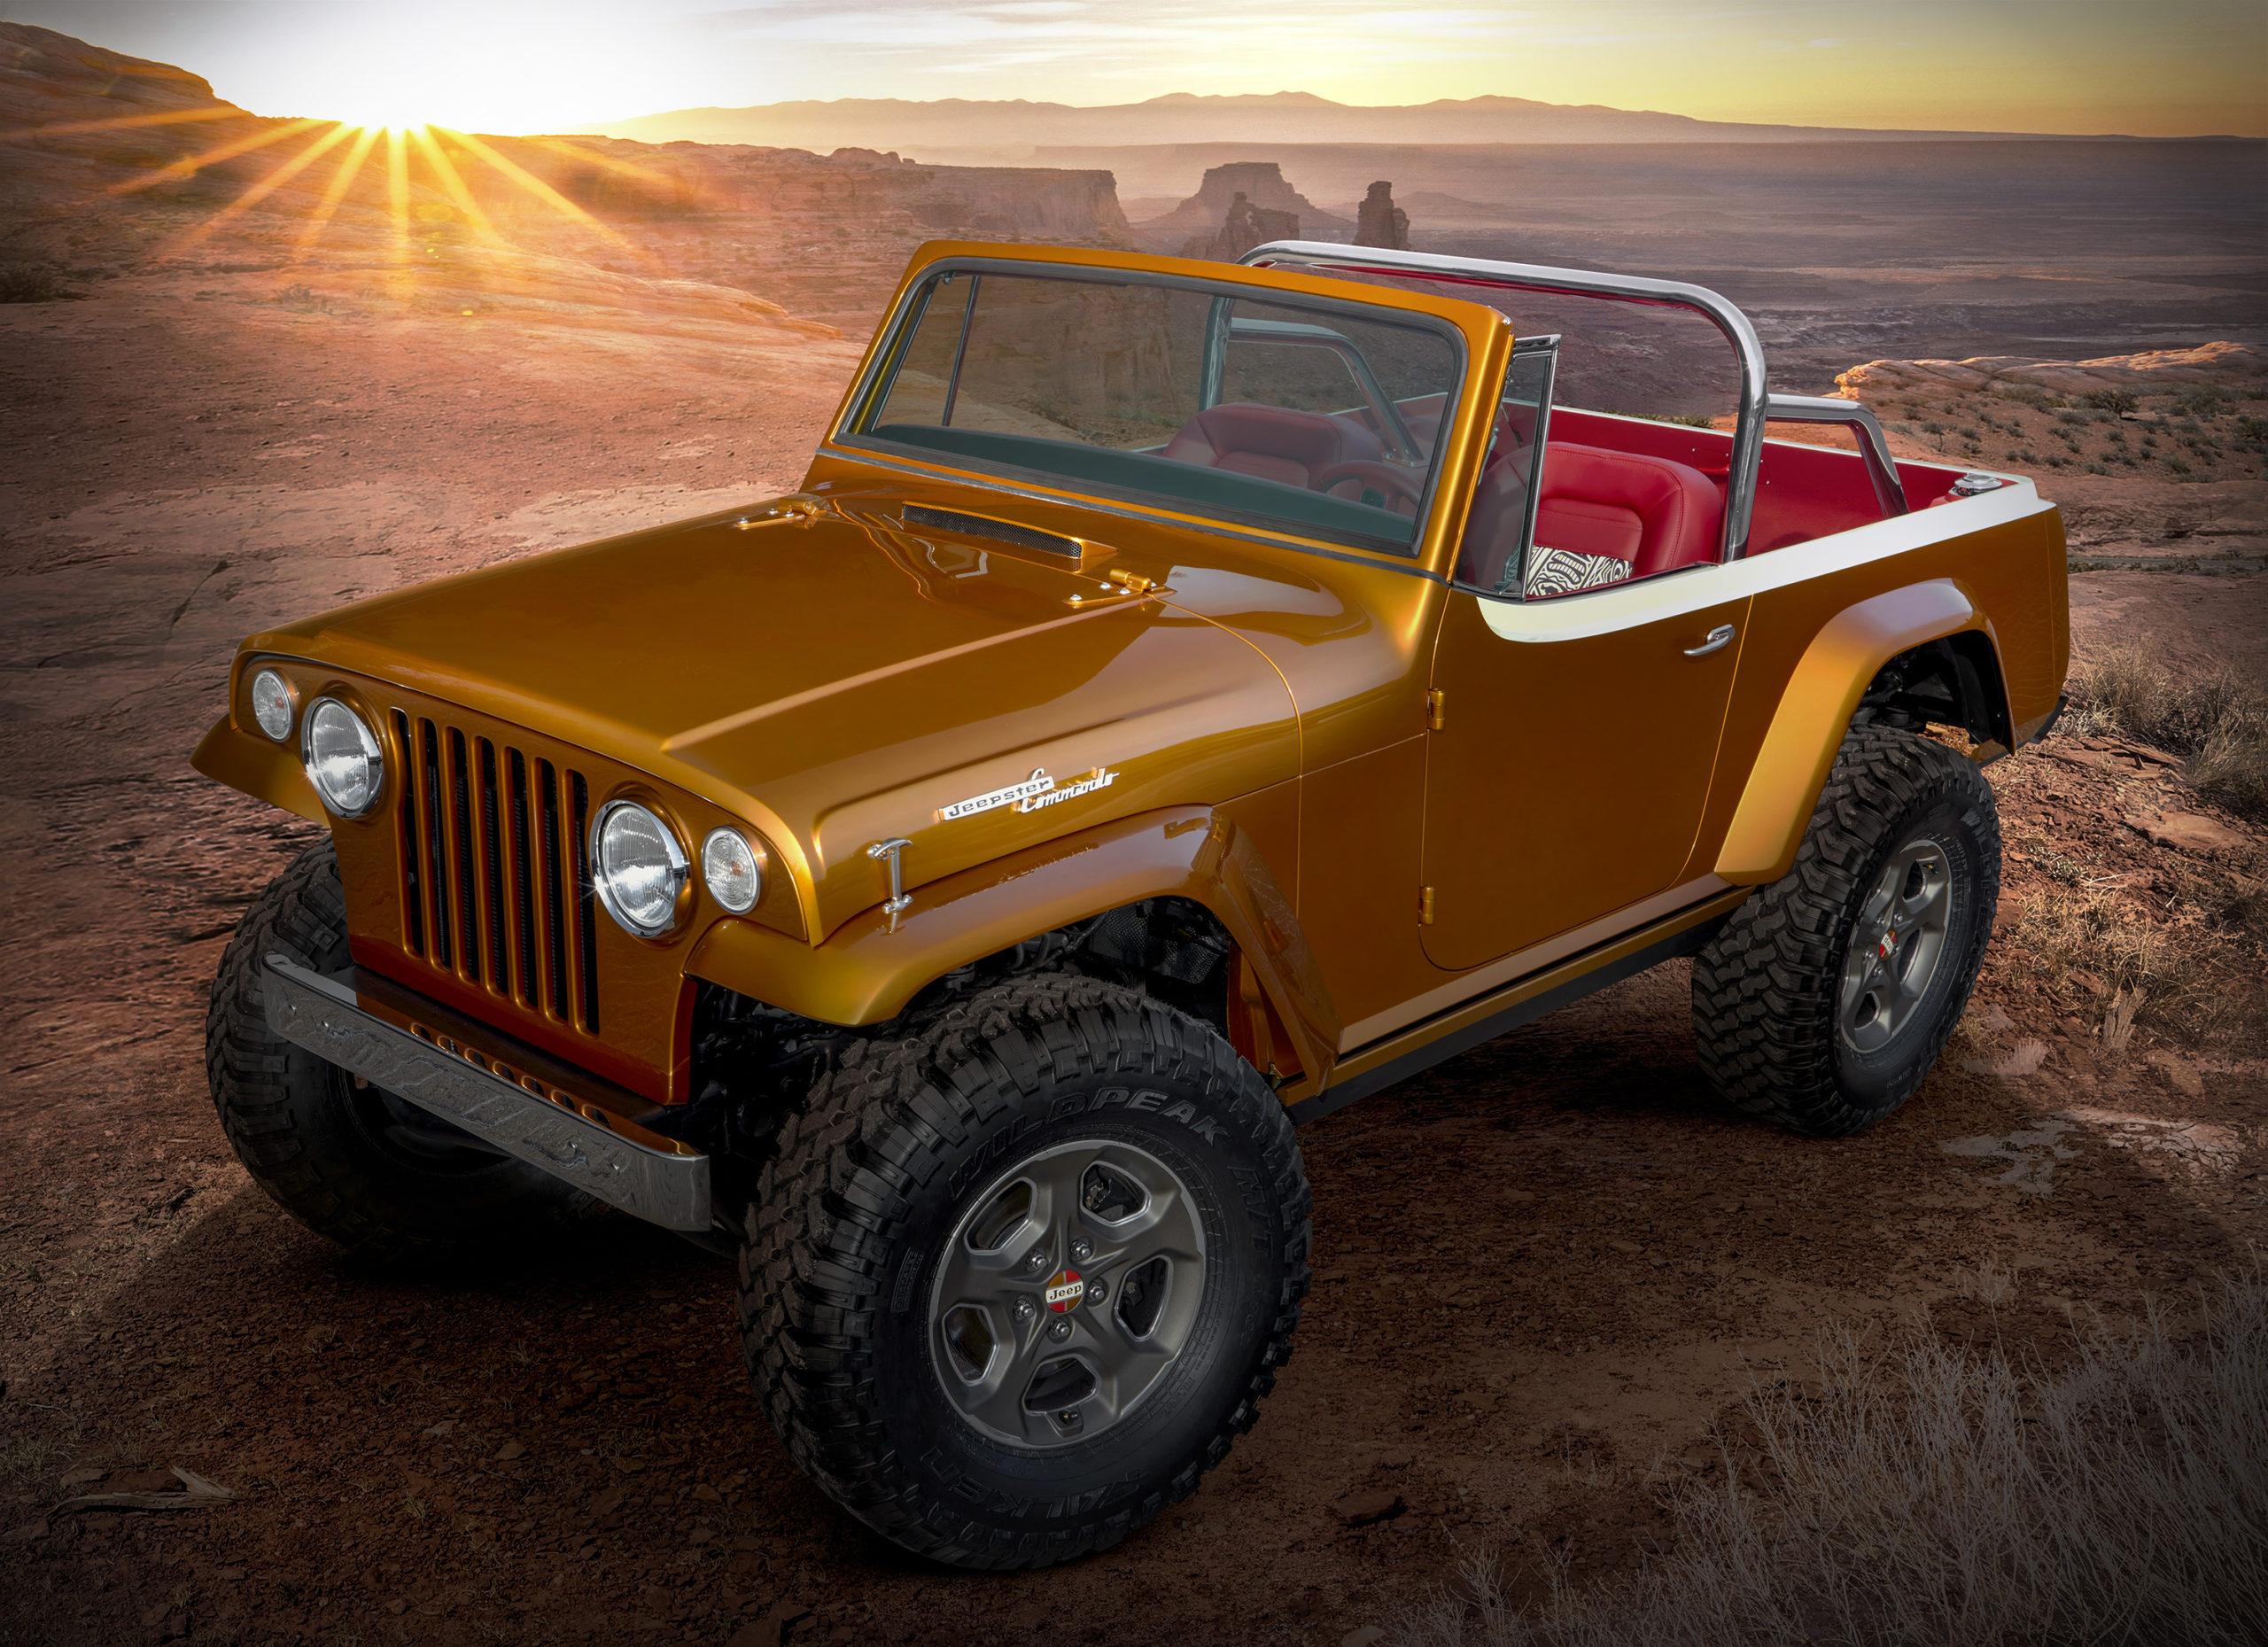 2021 Jeepster Beach Concept